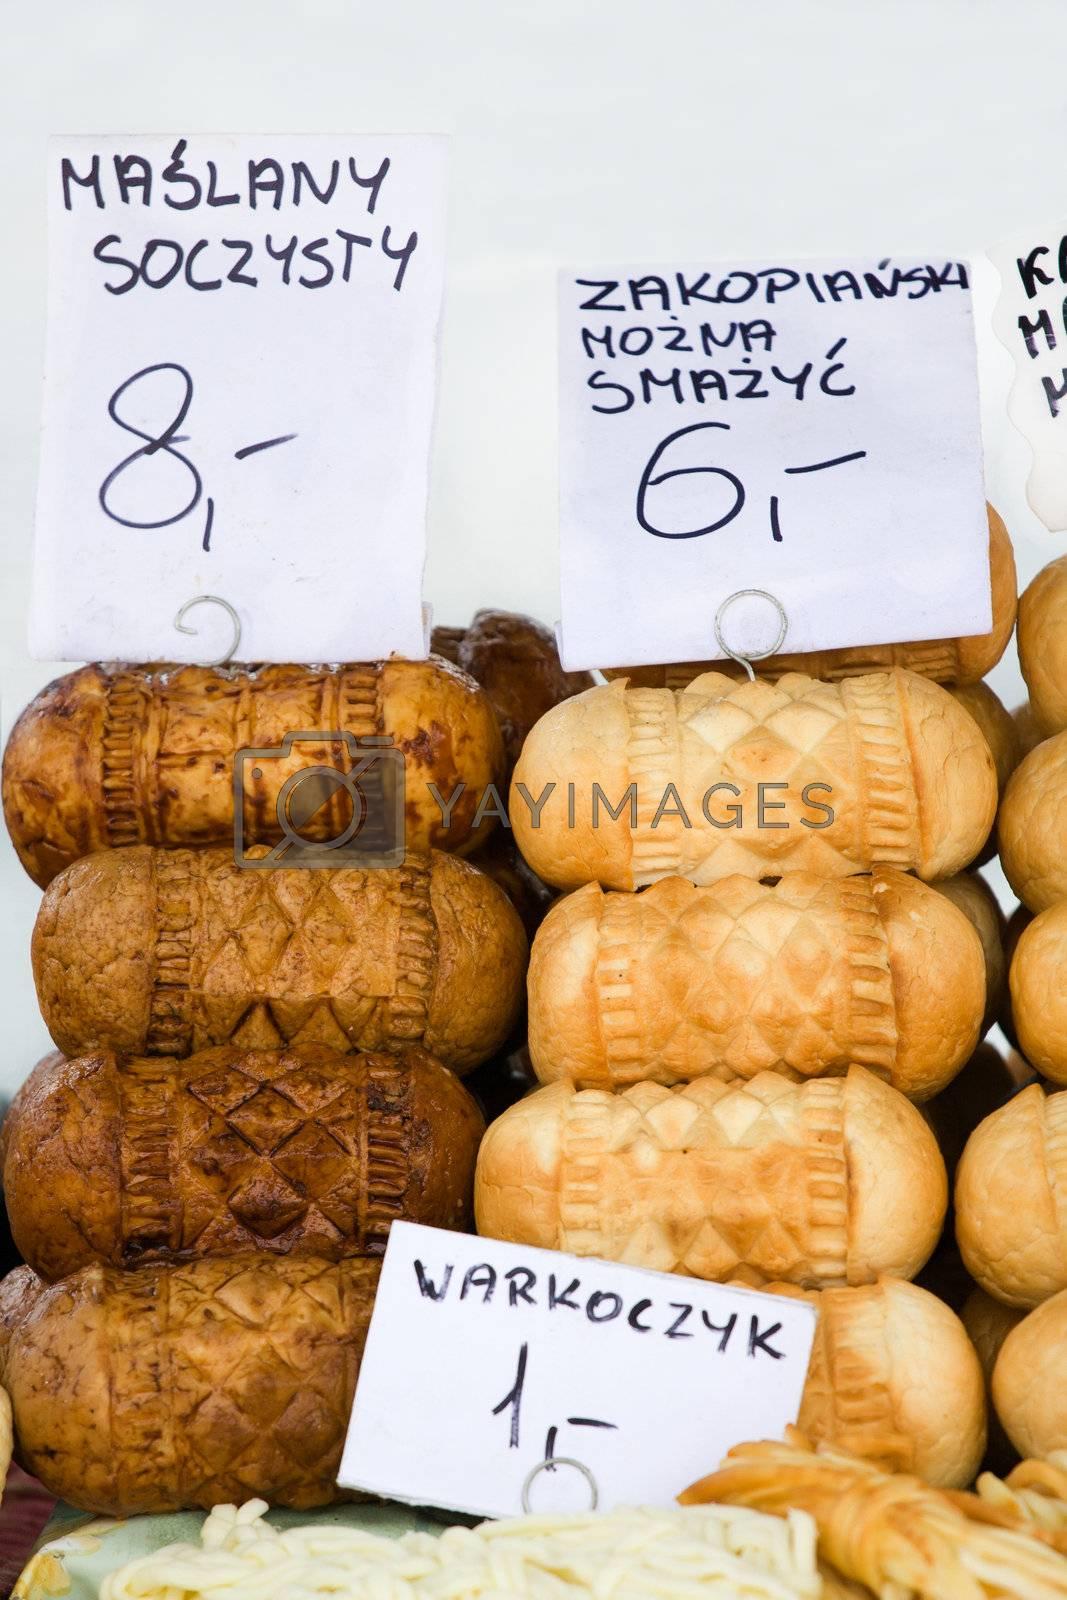 Smoked cheese Oscypki on the market in Zakopane Poland by SergeyAK